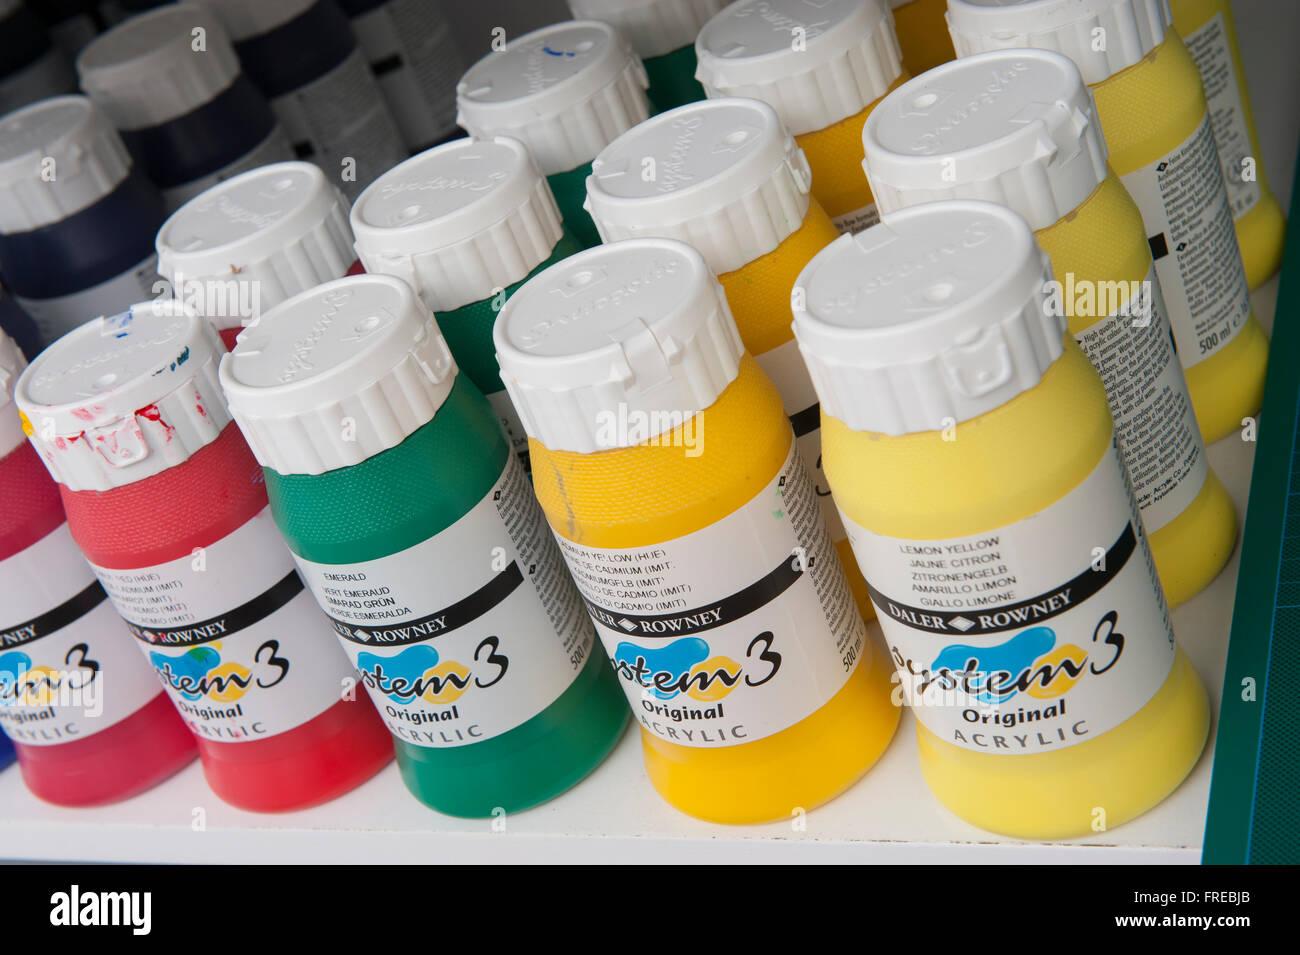 Bottles of acrylic paint - Stock Image